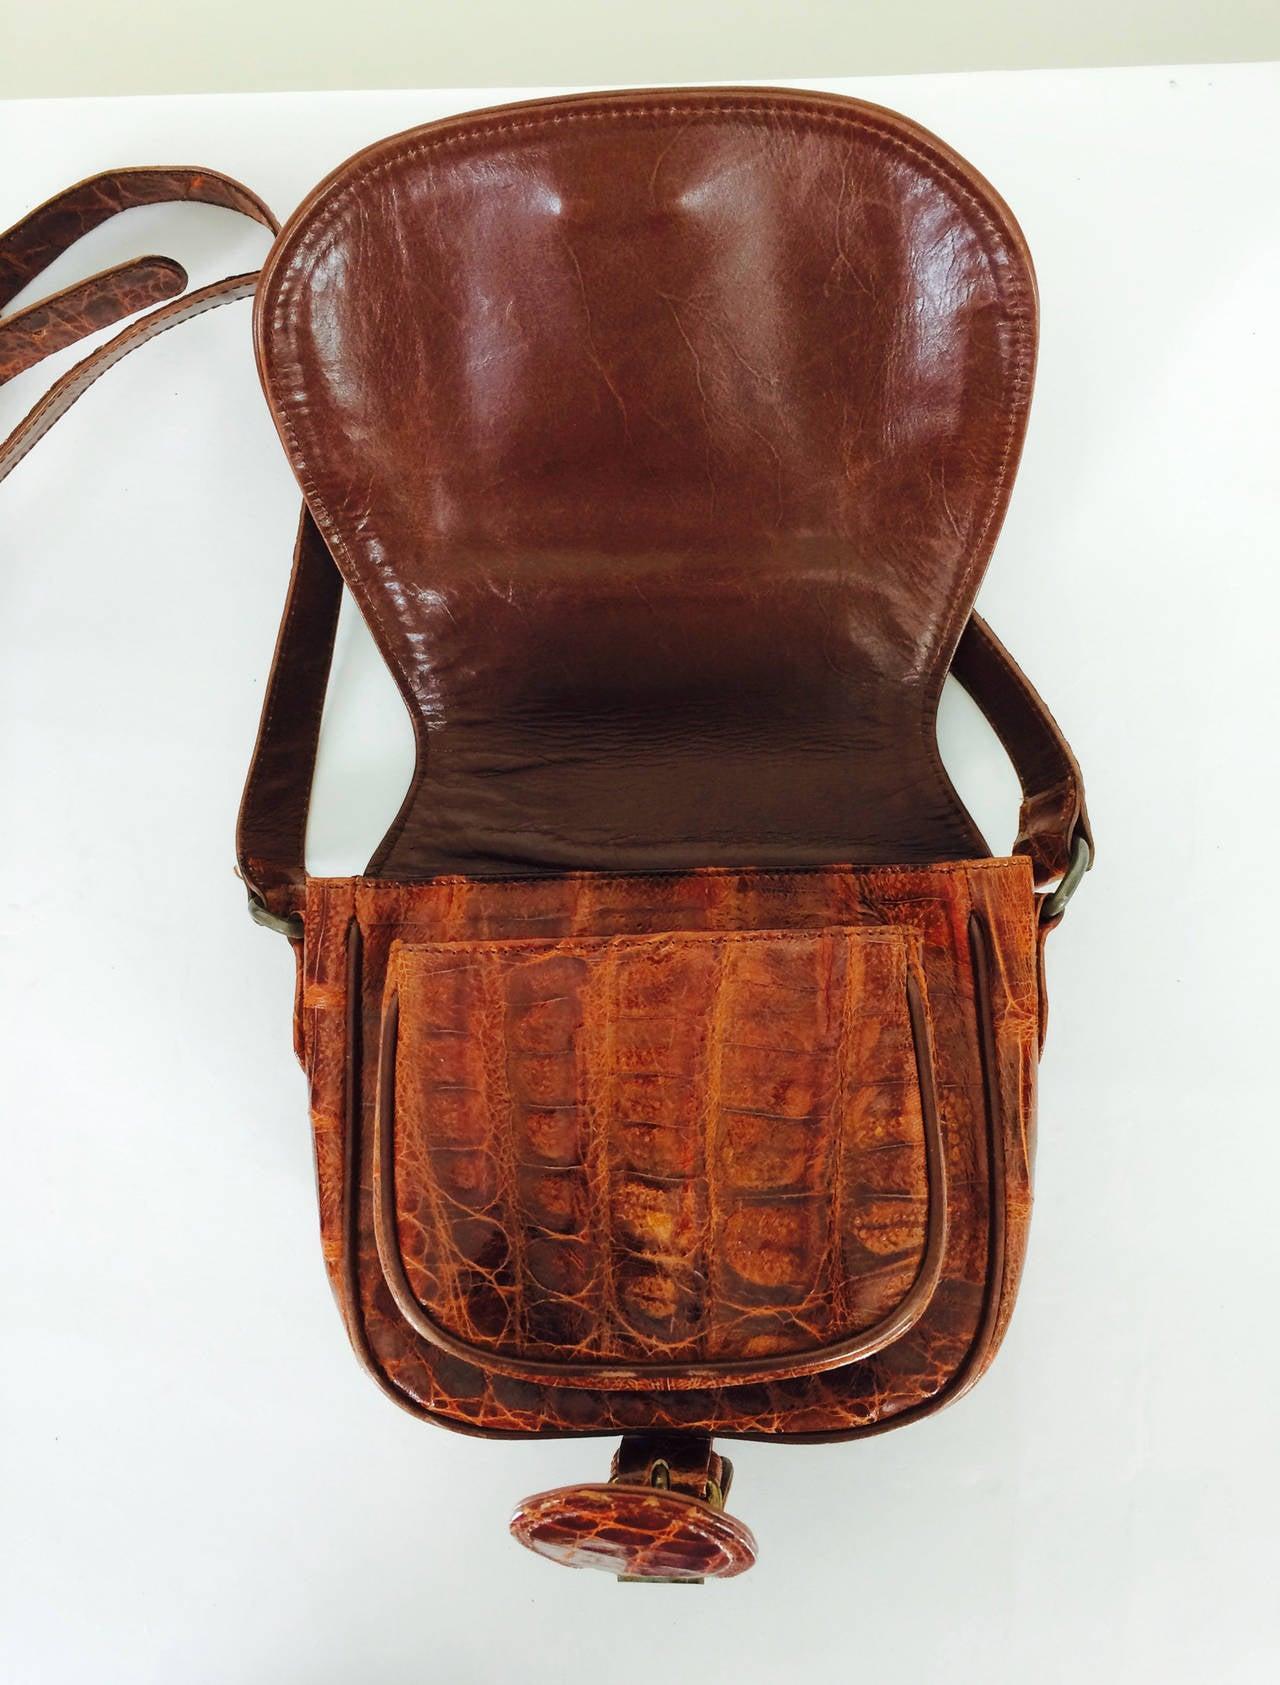 Saddle bag handbag cognac leather faux alligator Neiman Marcus 1980s 5